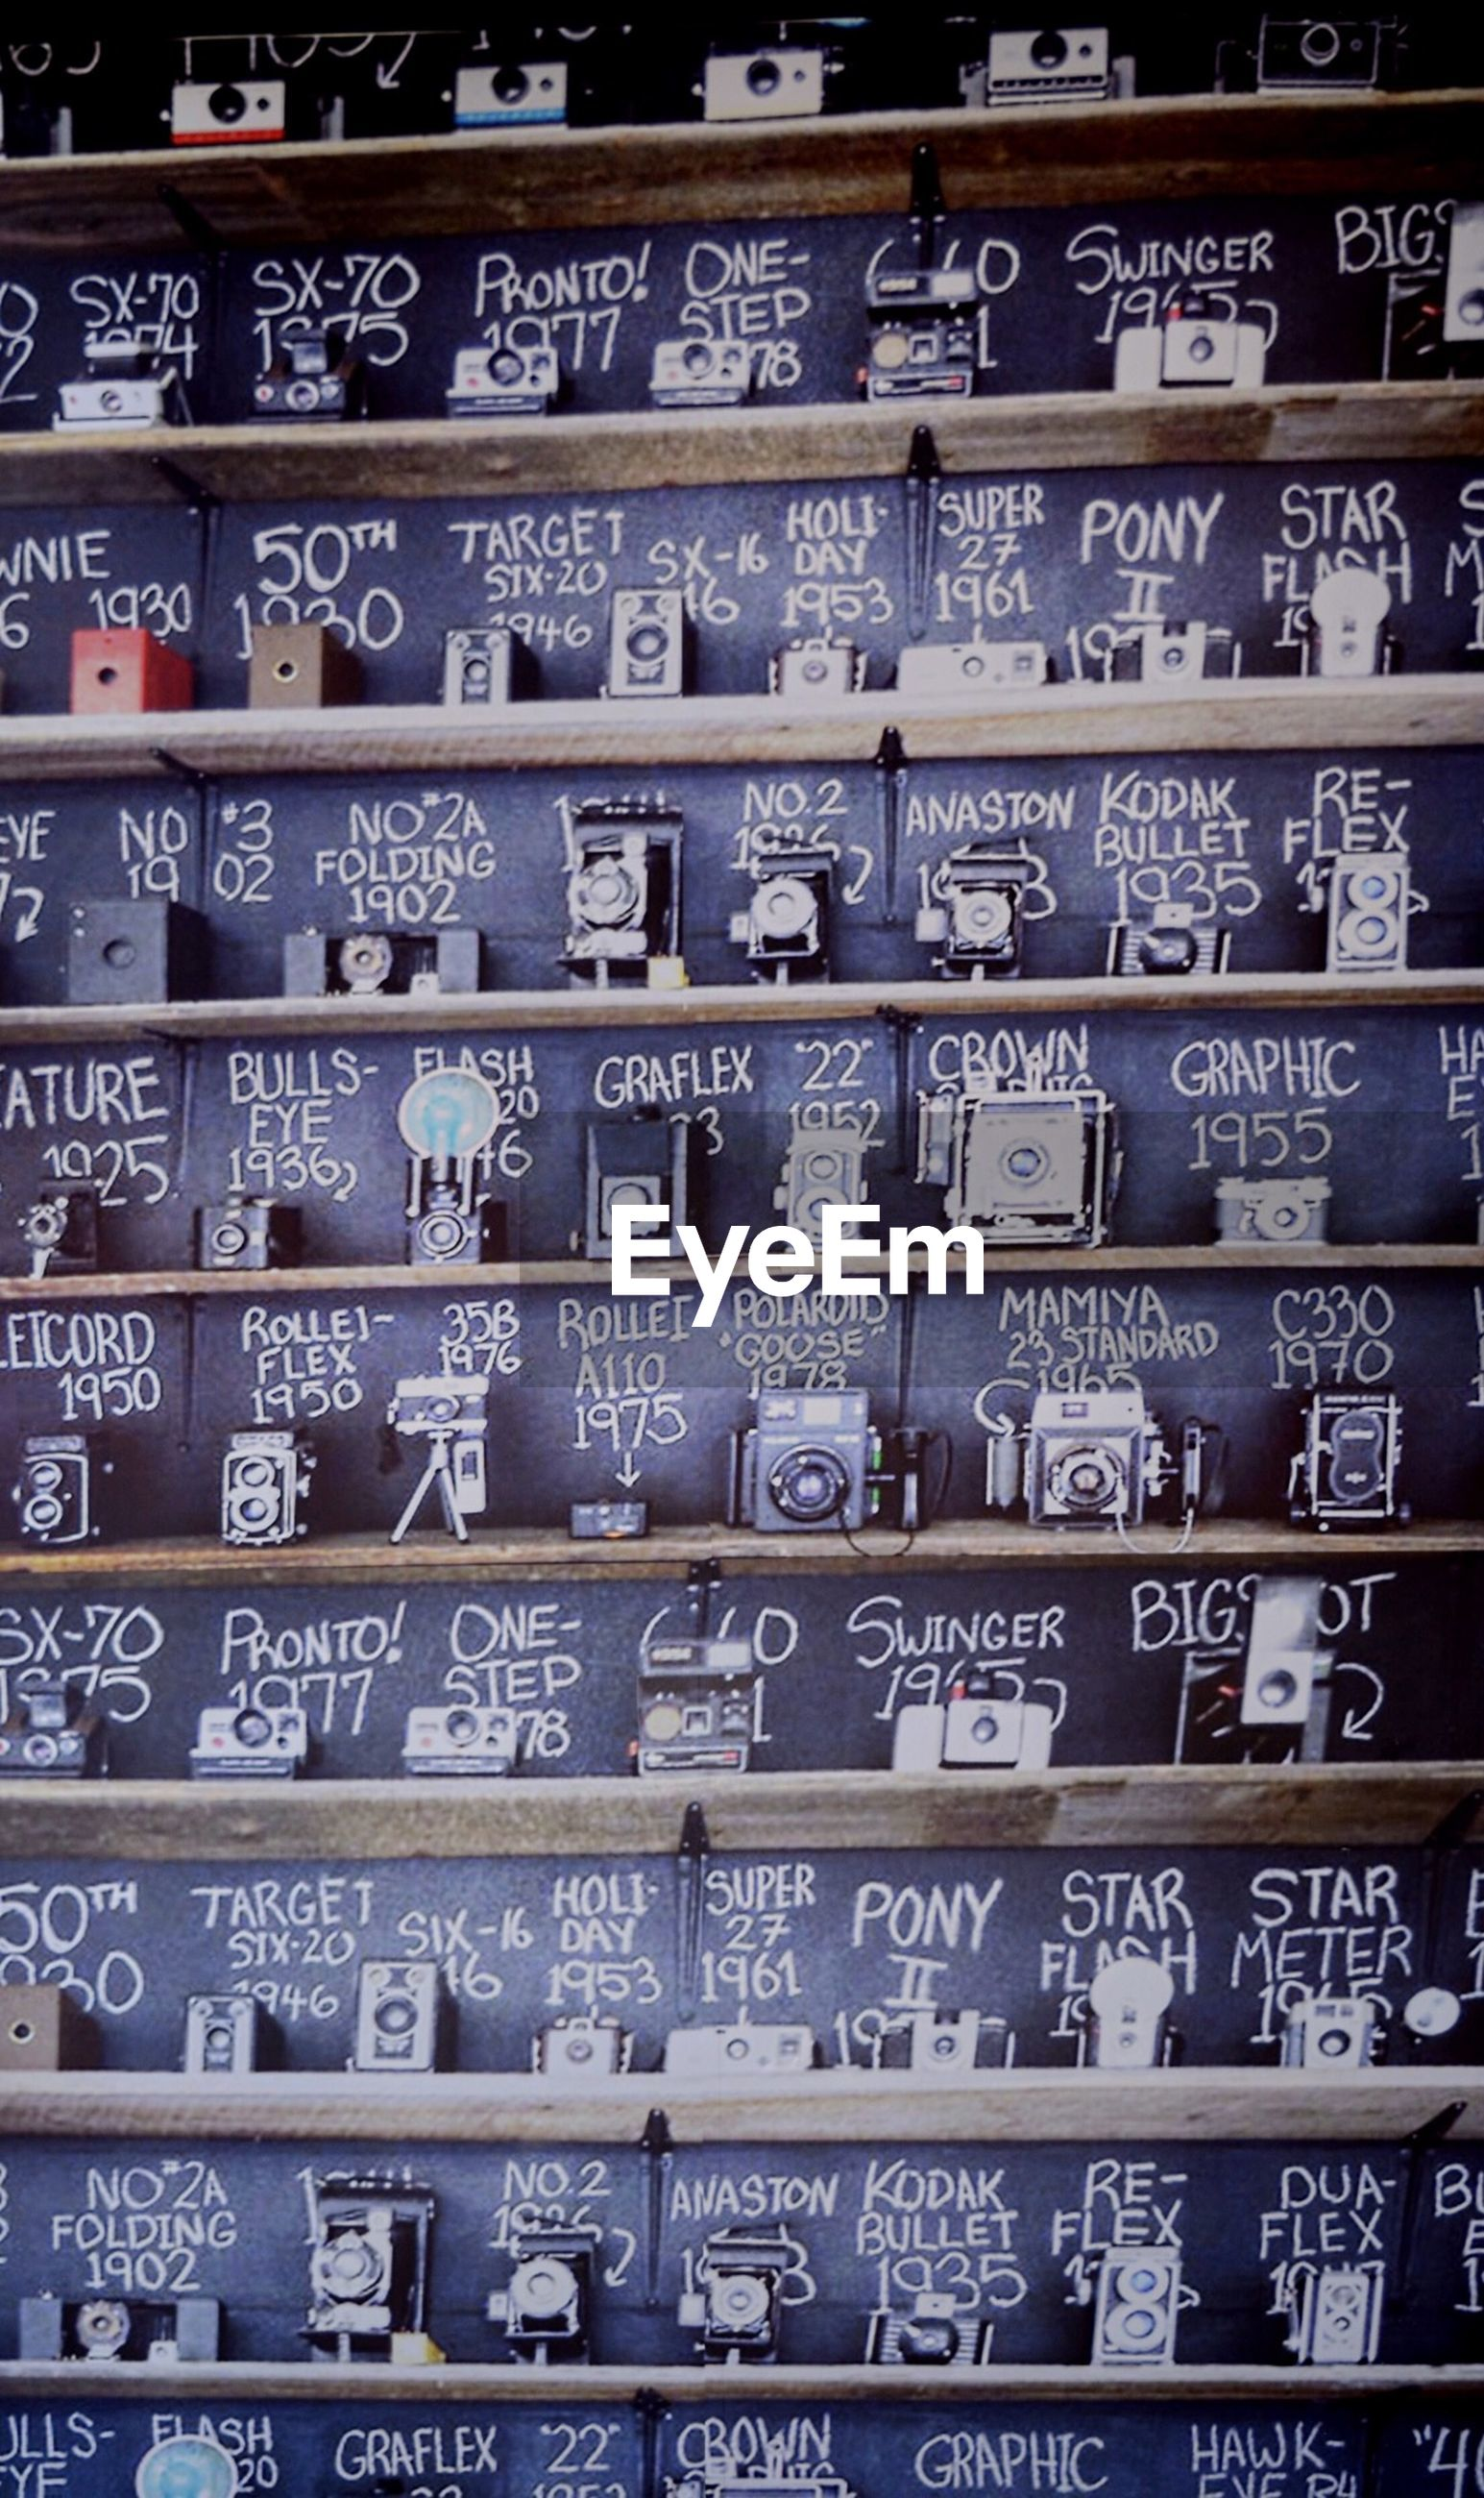 Various cameras arranged in shelf